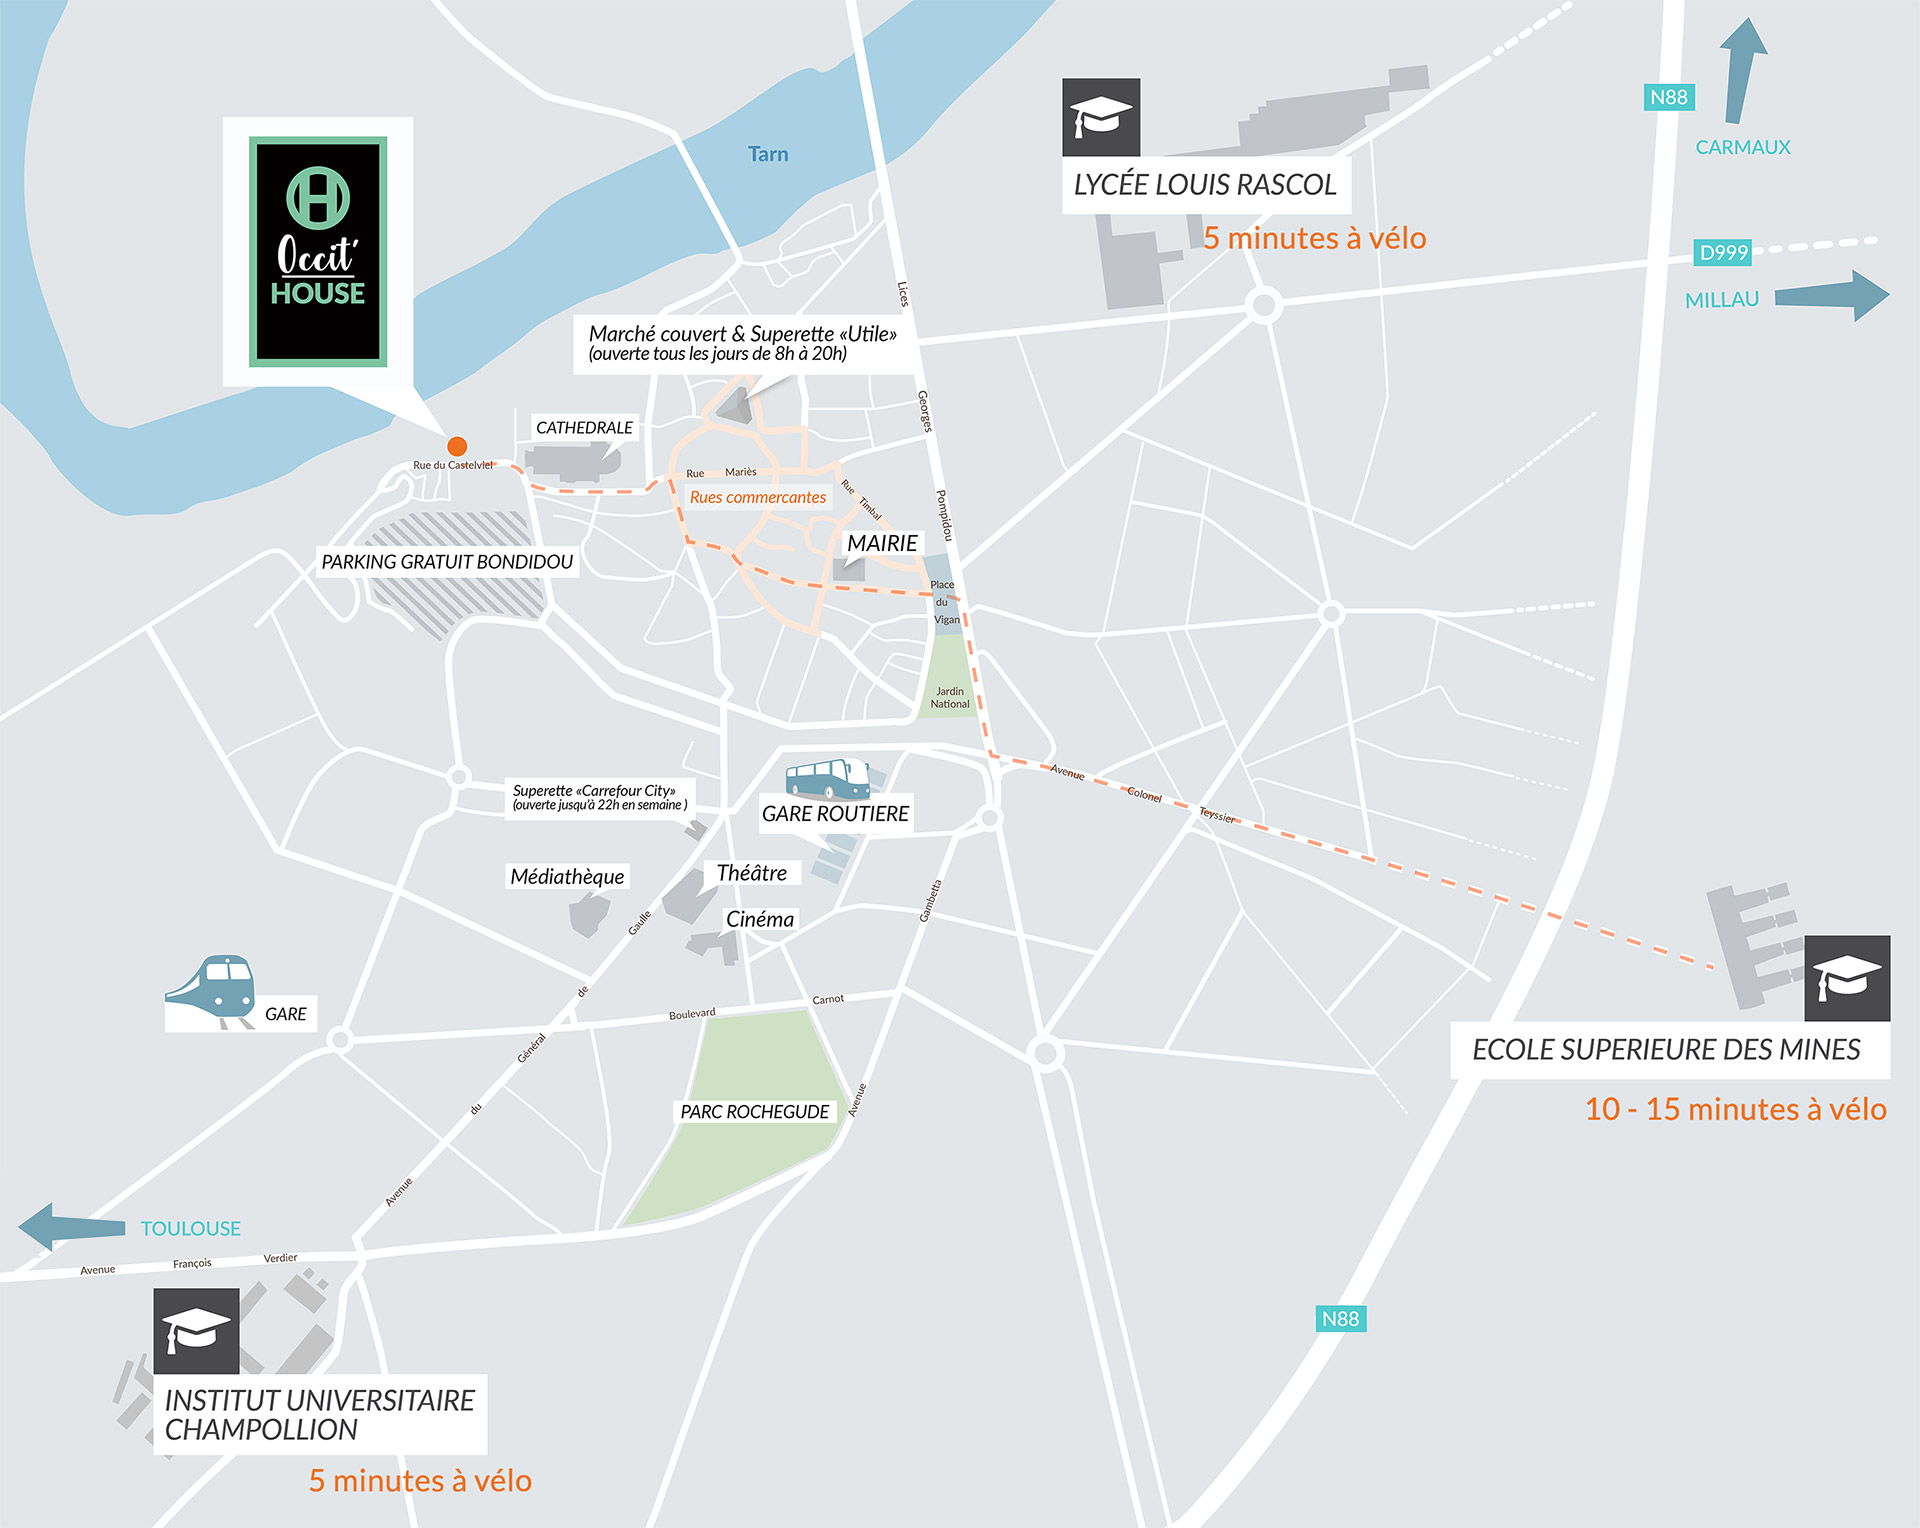 occit-house_situation-geographique_plan_mini-c